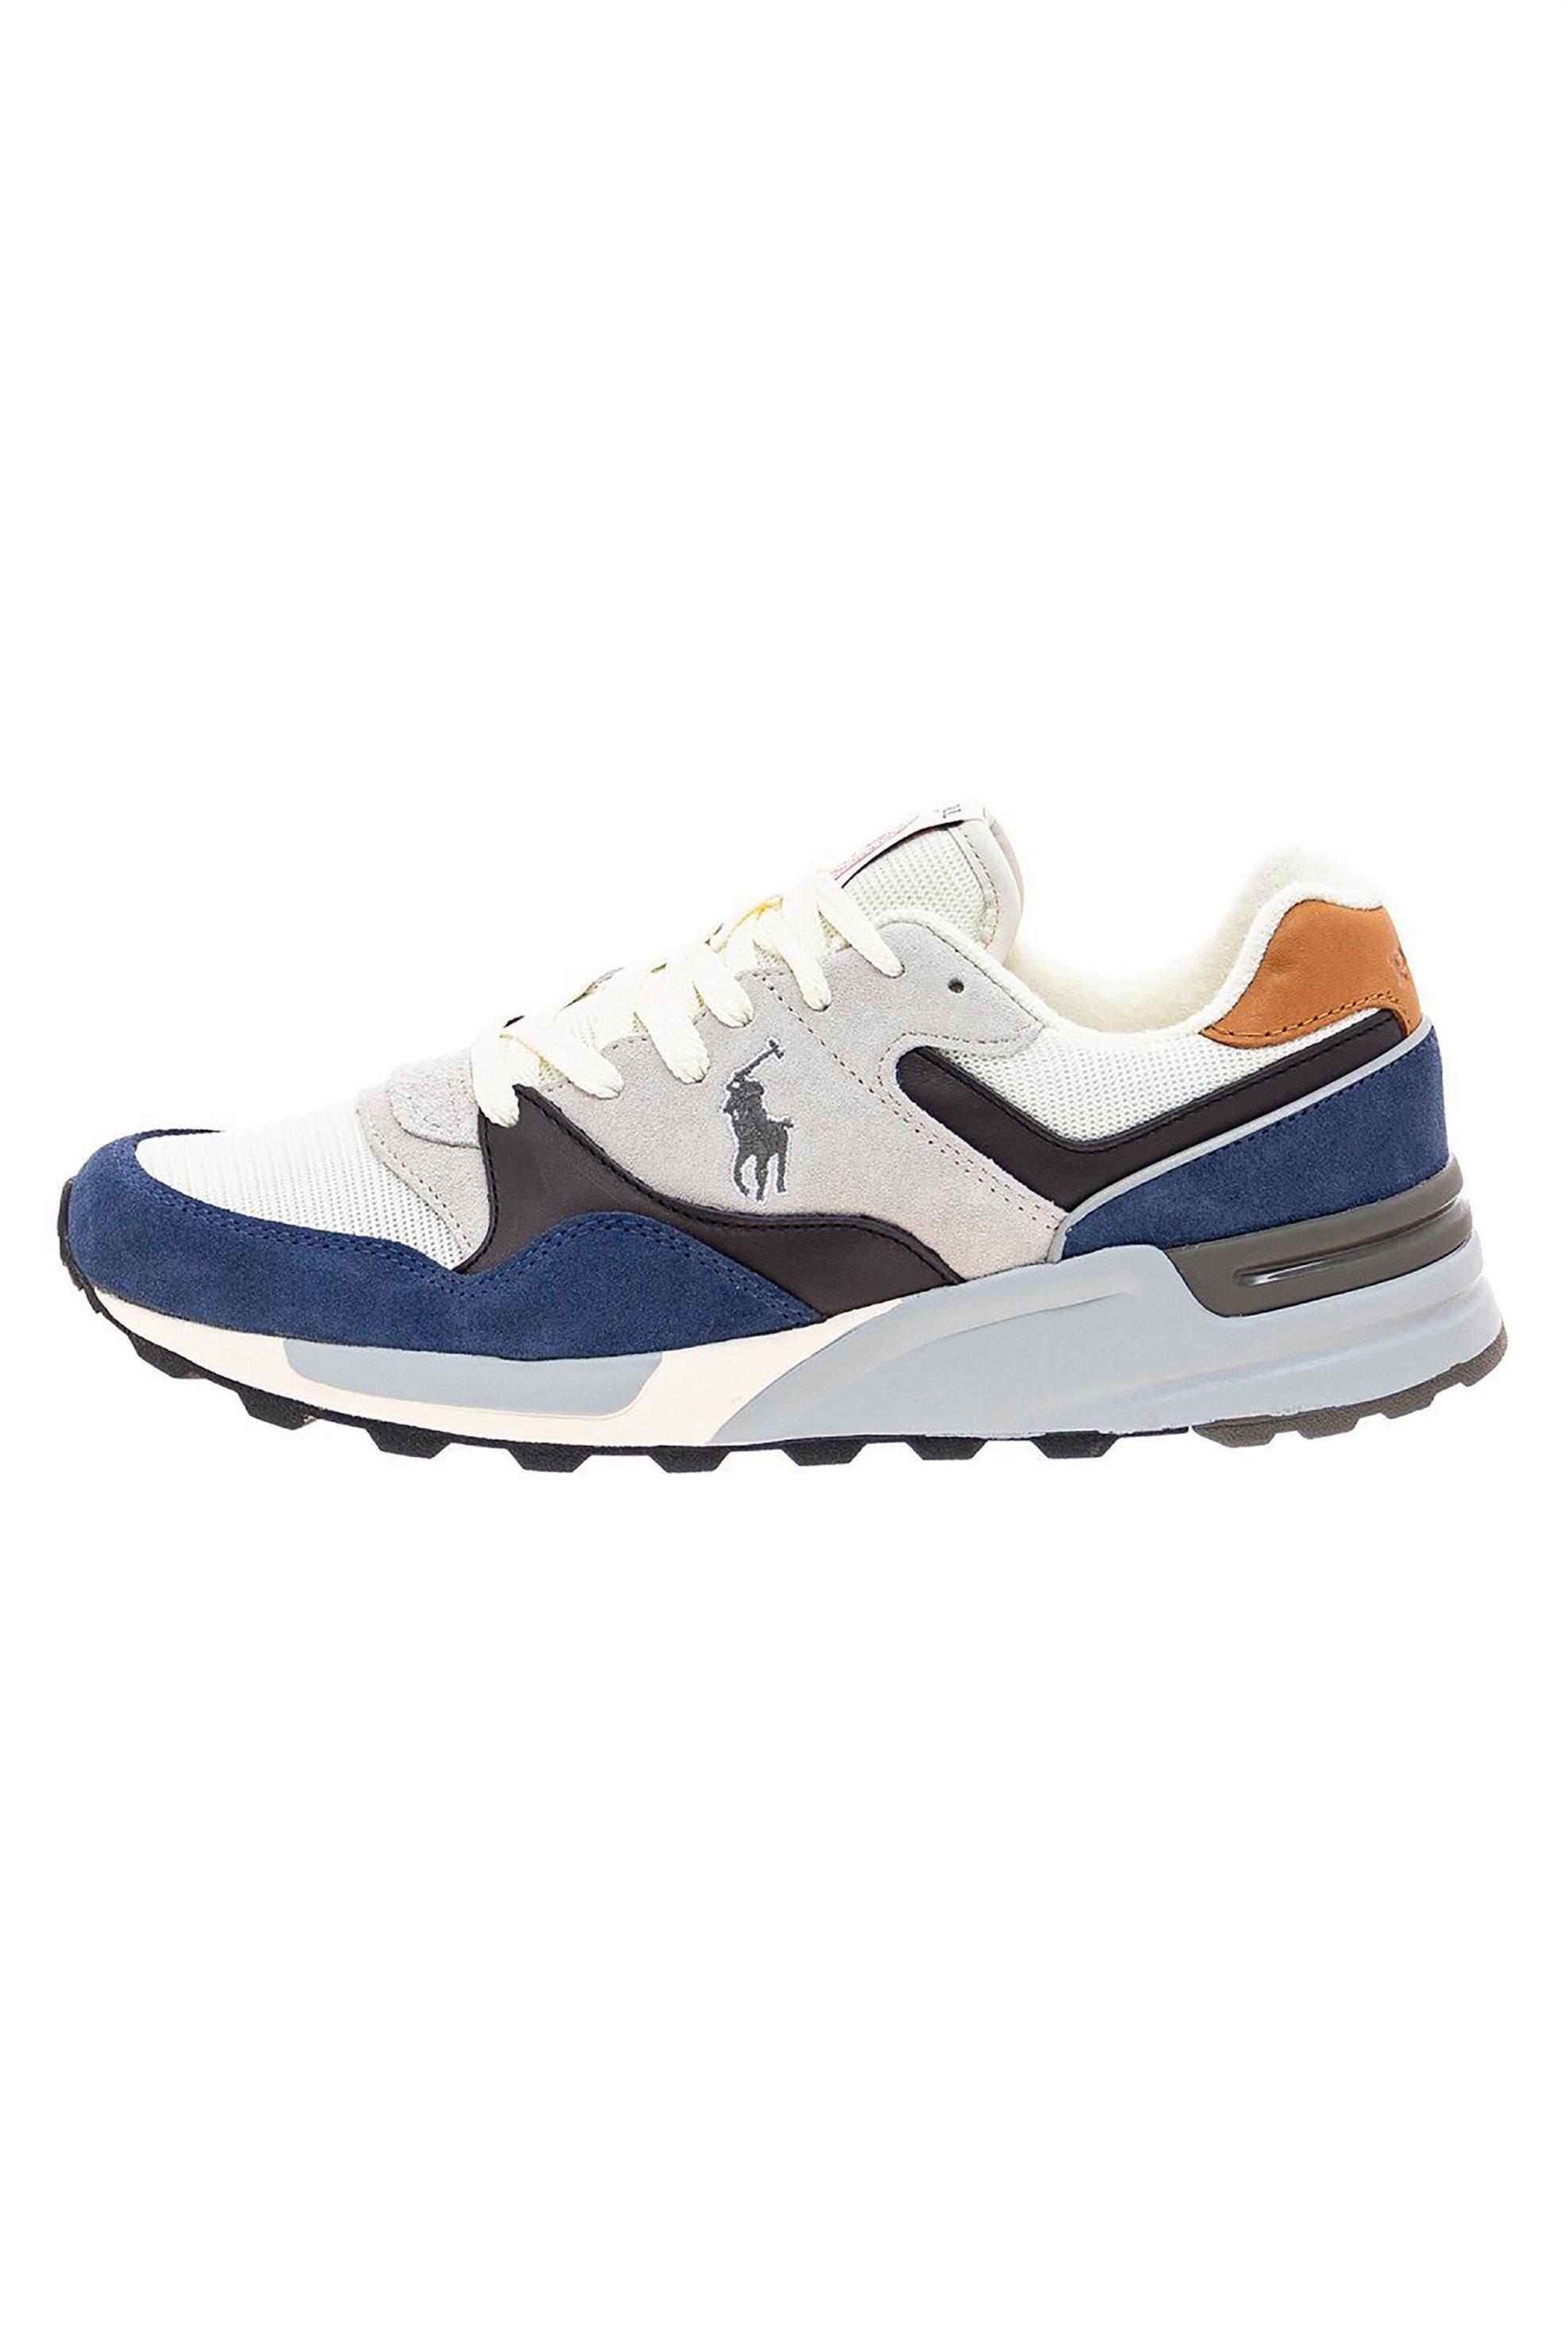 Polo Ralph Lauren ανδρικά suede sneakers με κορδόνια – 809786694001 – Μπλε